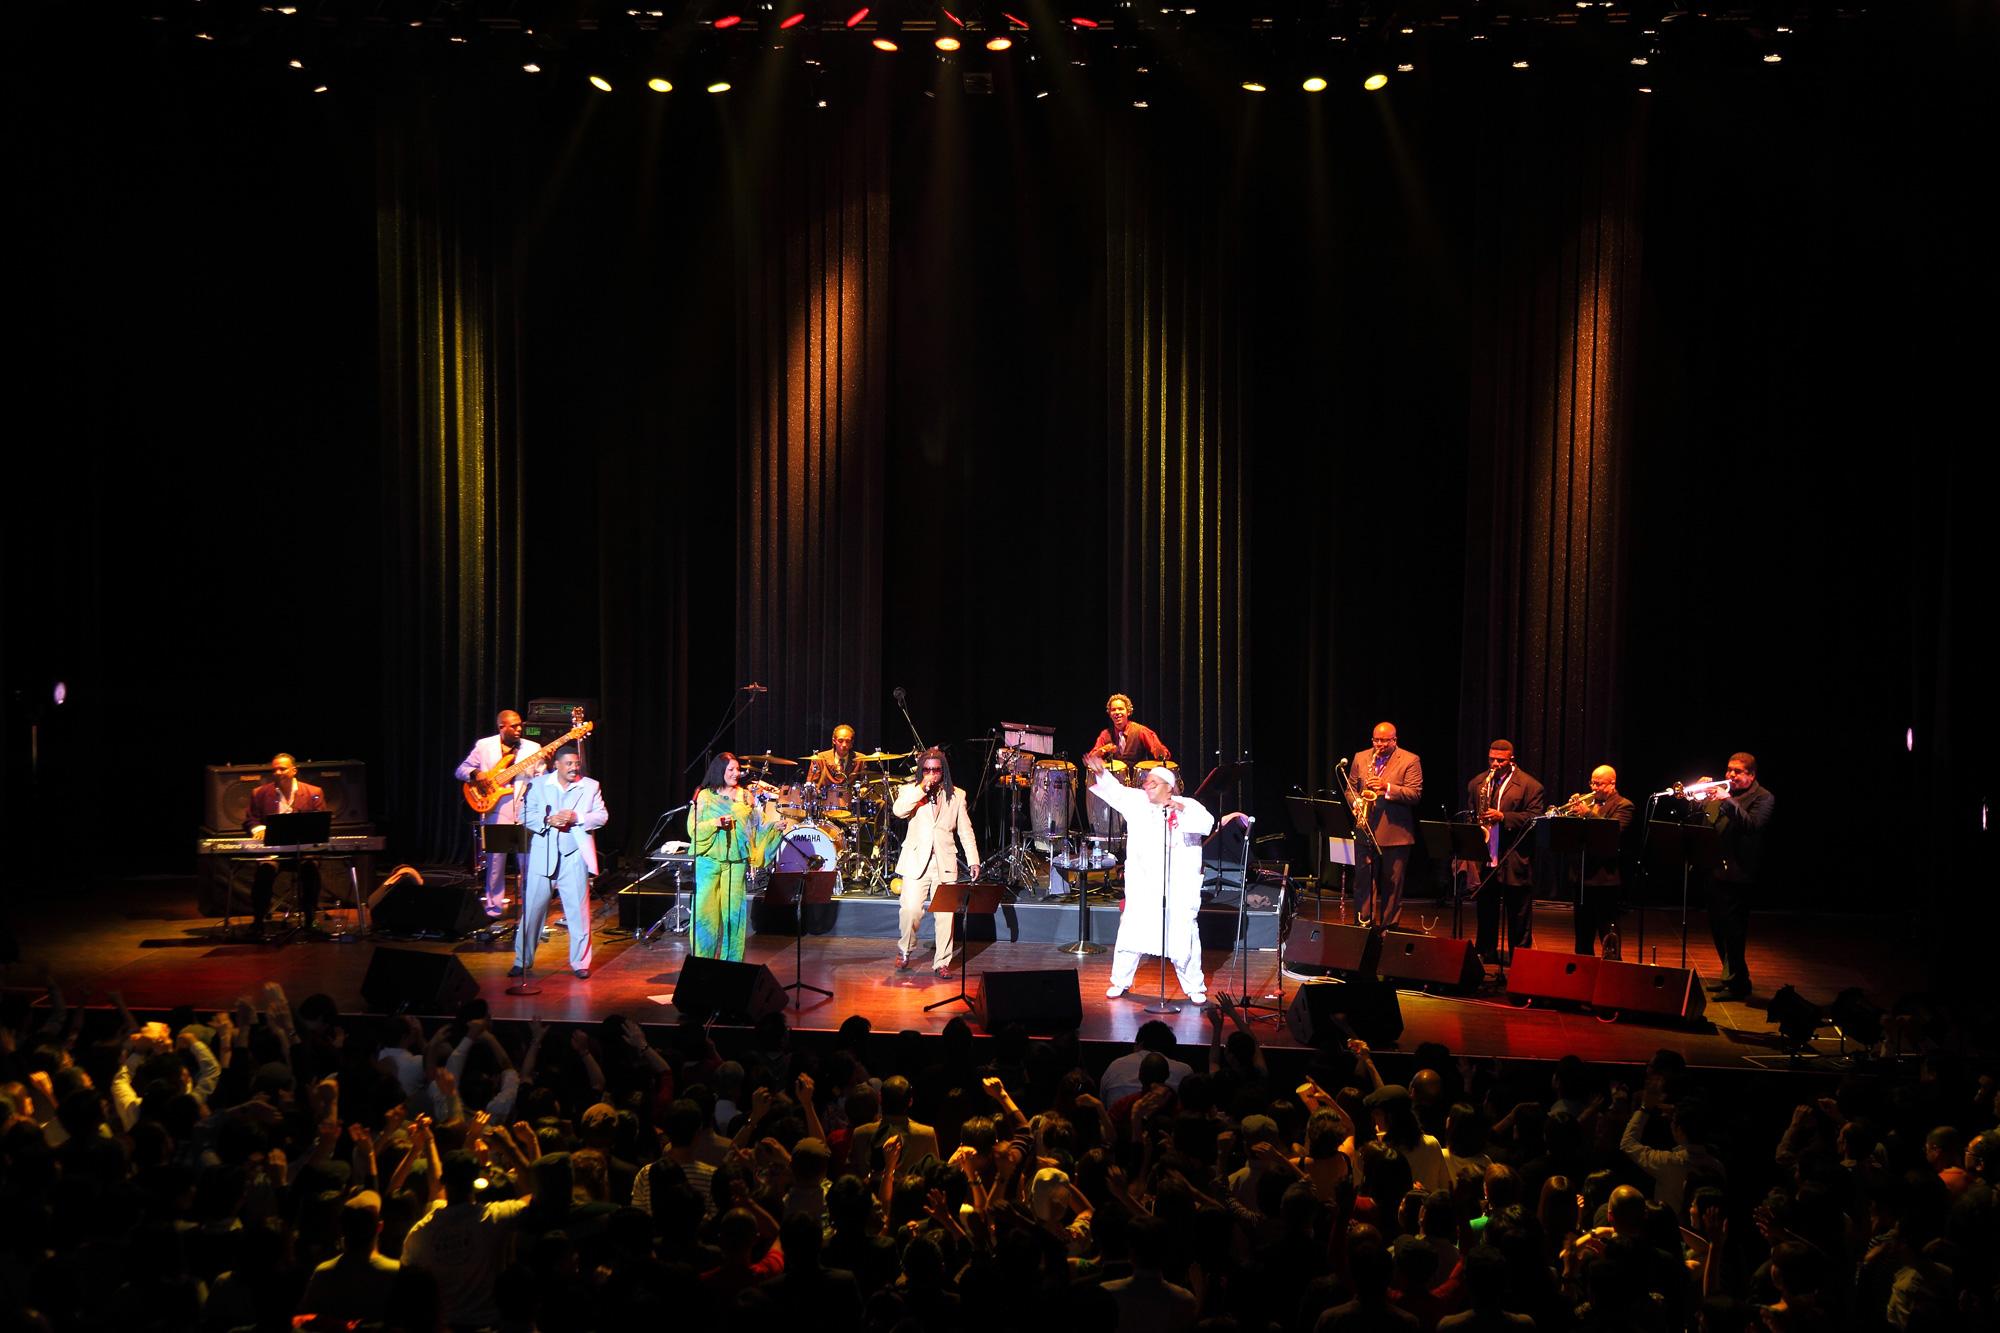 キューバ 音楽 村上 龍